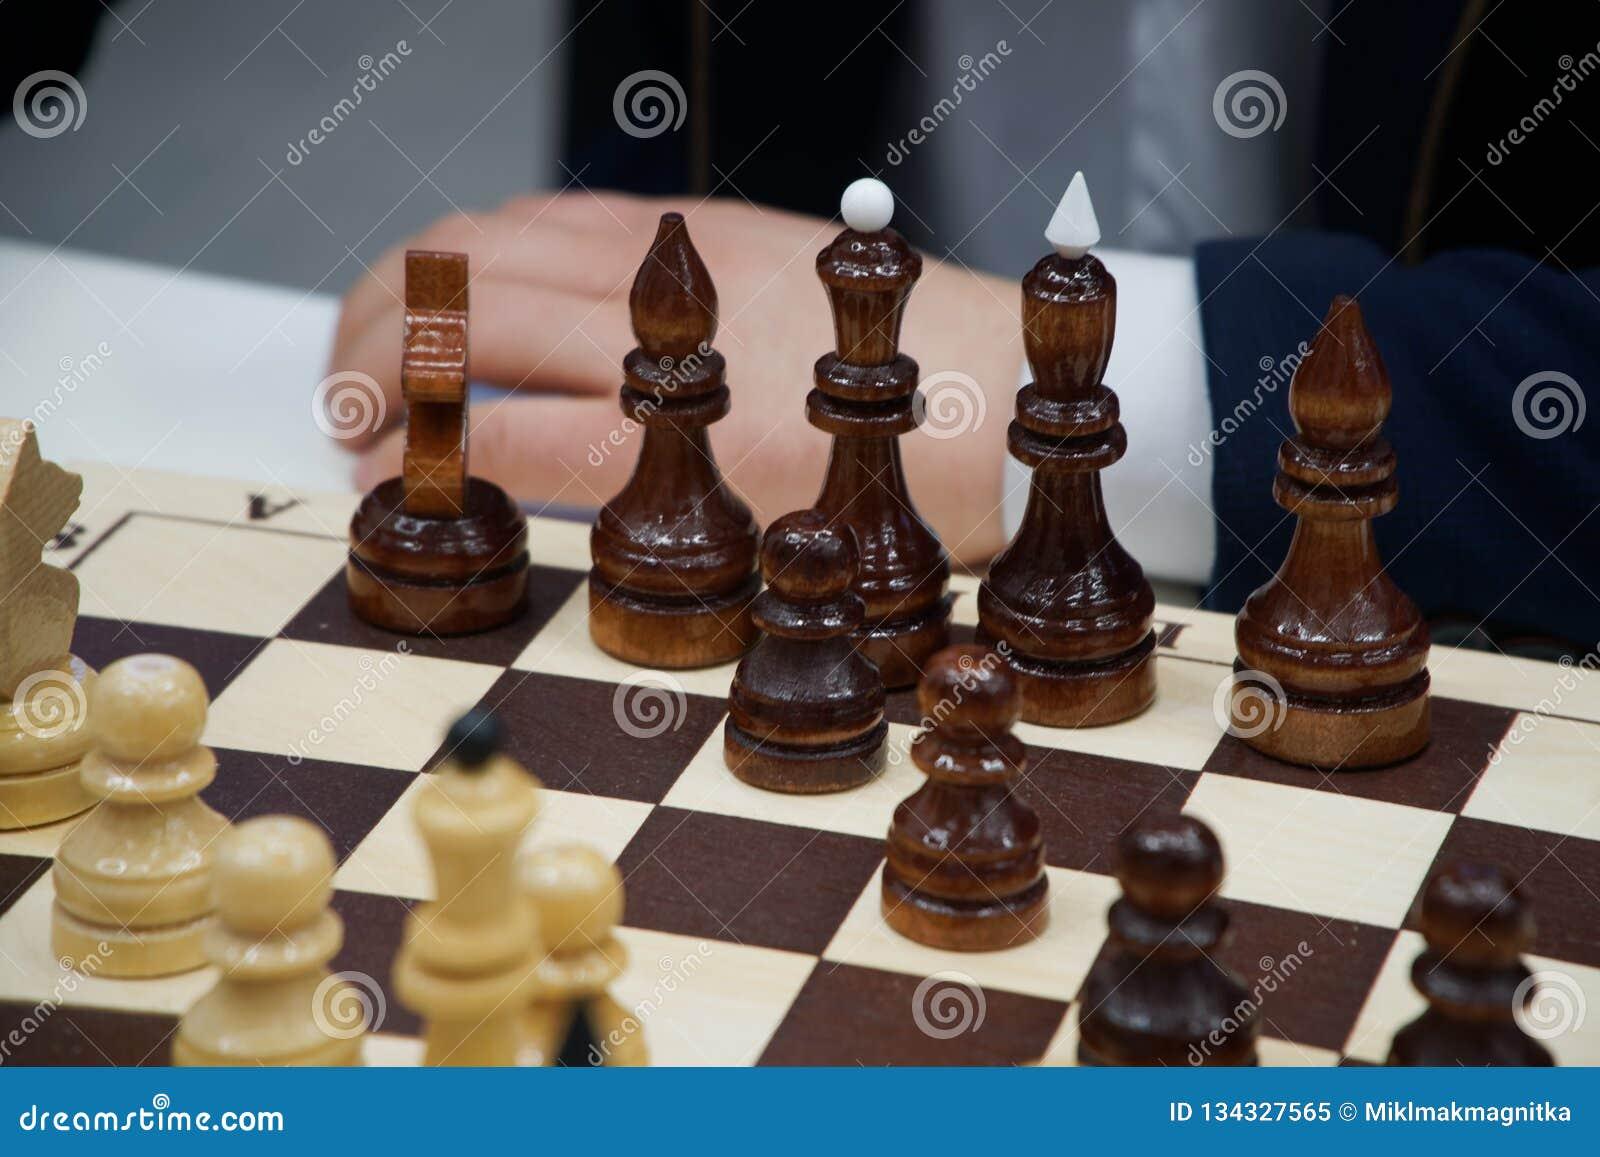 человек играет шахмат Шахматы и дело